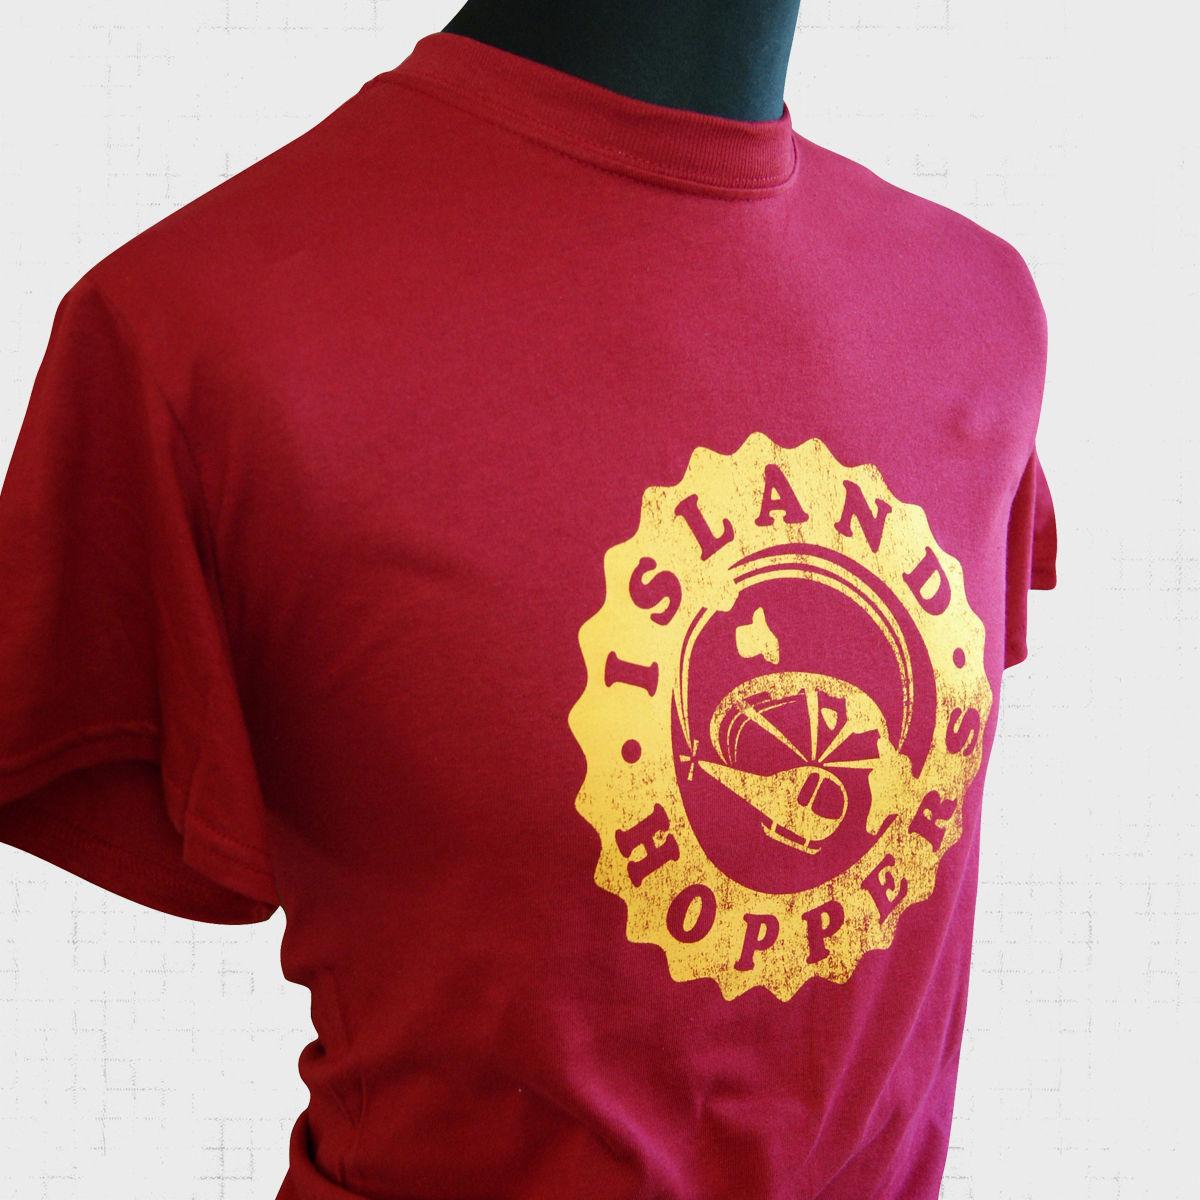 ISLAND HOPPERS LOGO Kids Boys T-Shirt Tom TV Selleck Hawaii Retro Kult Magnum